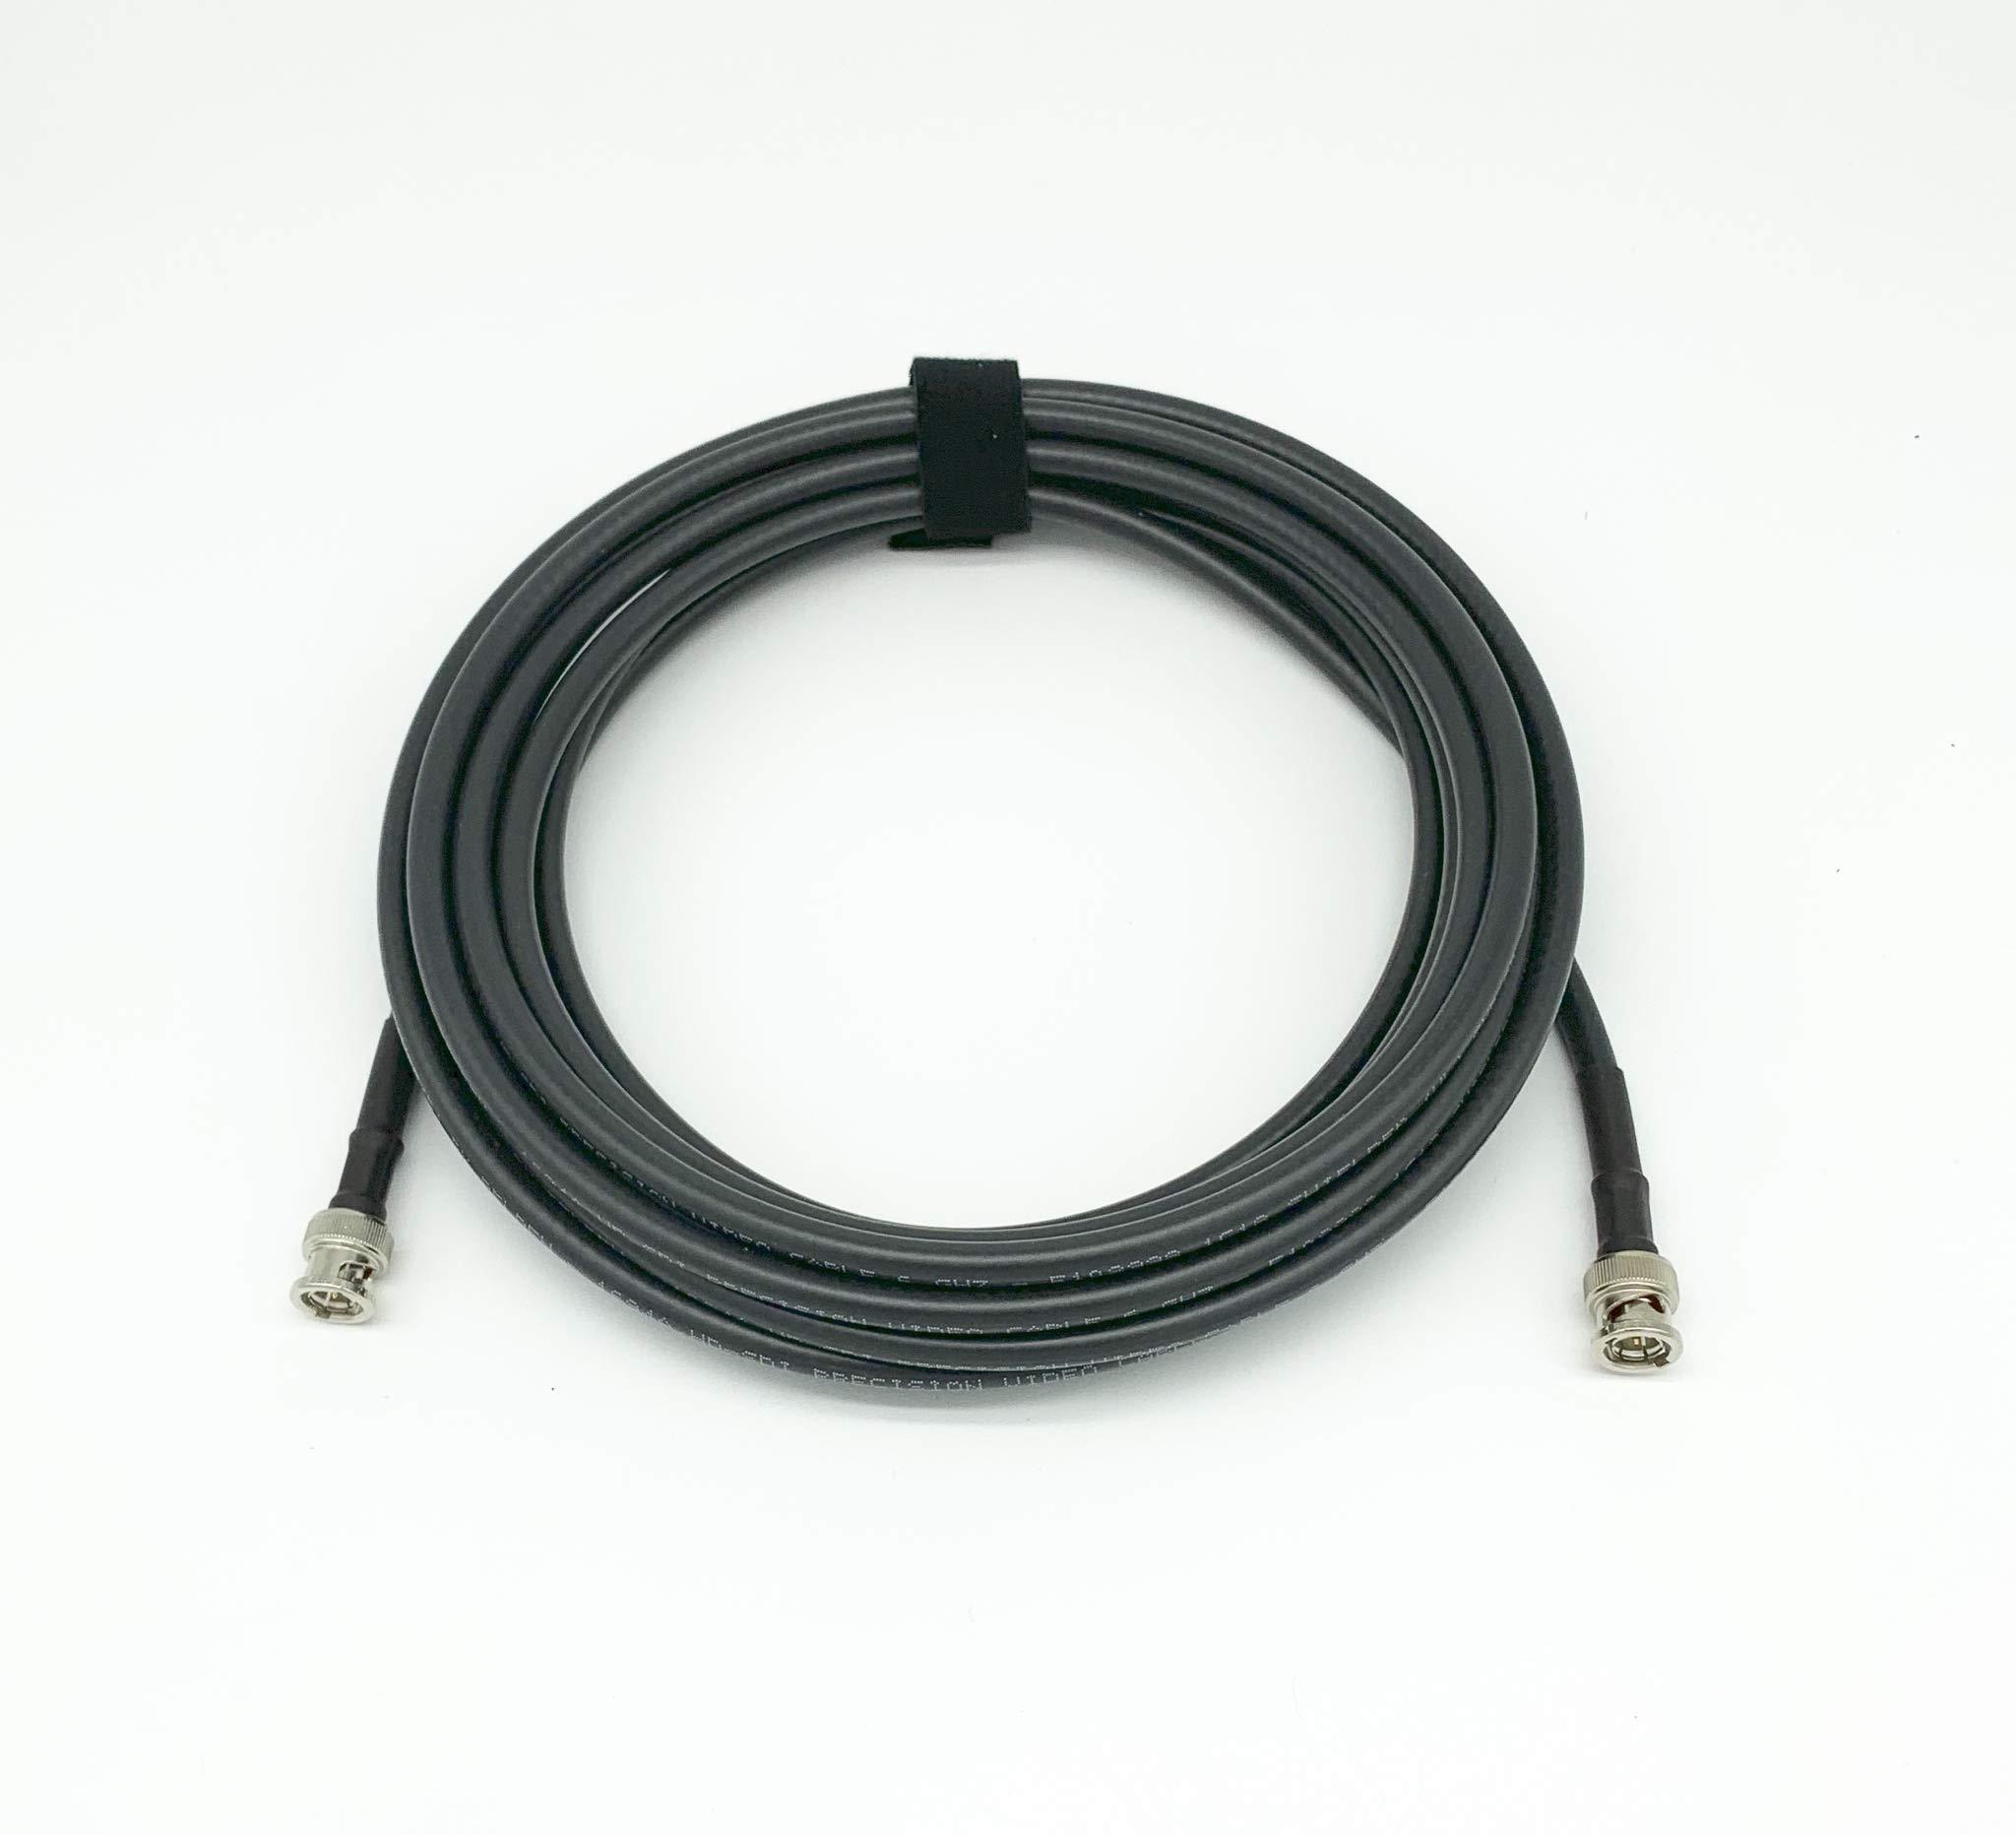 AV-Cables 3G/6G HD SDI BNC Cable- Belden 1694a RG6 - Black (150ft)